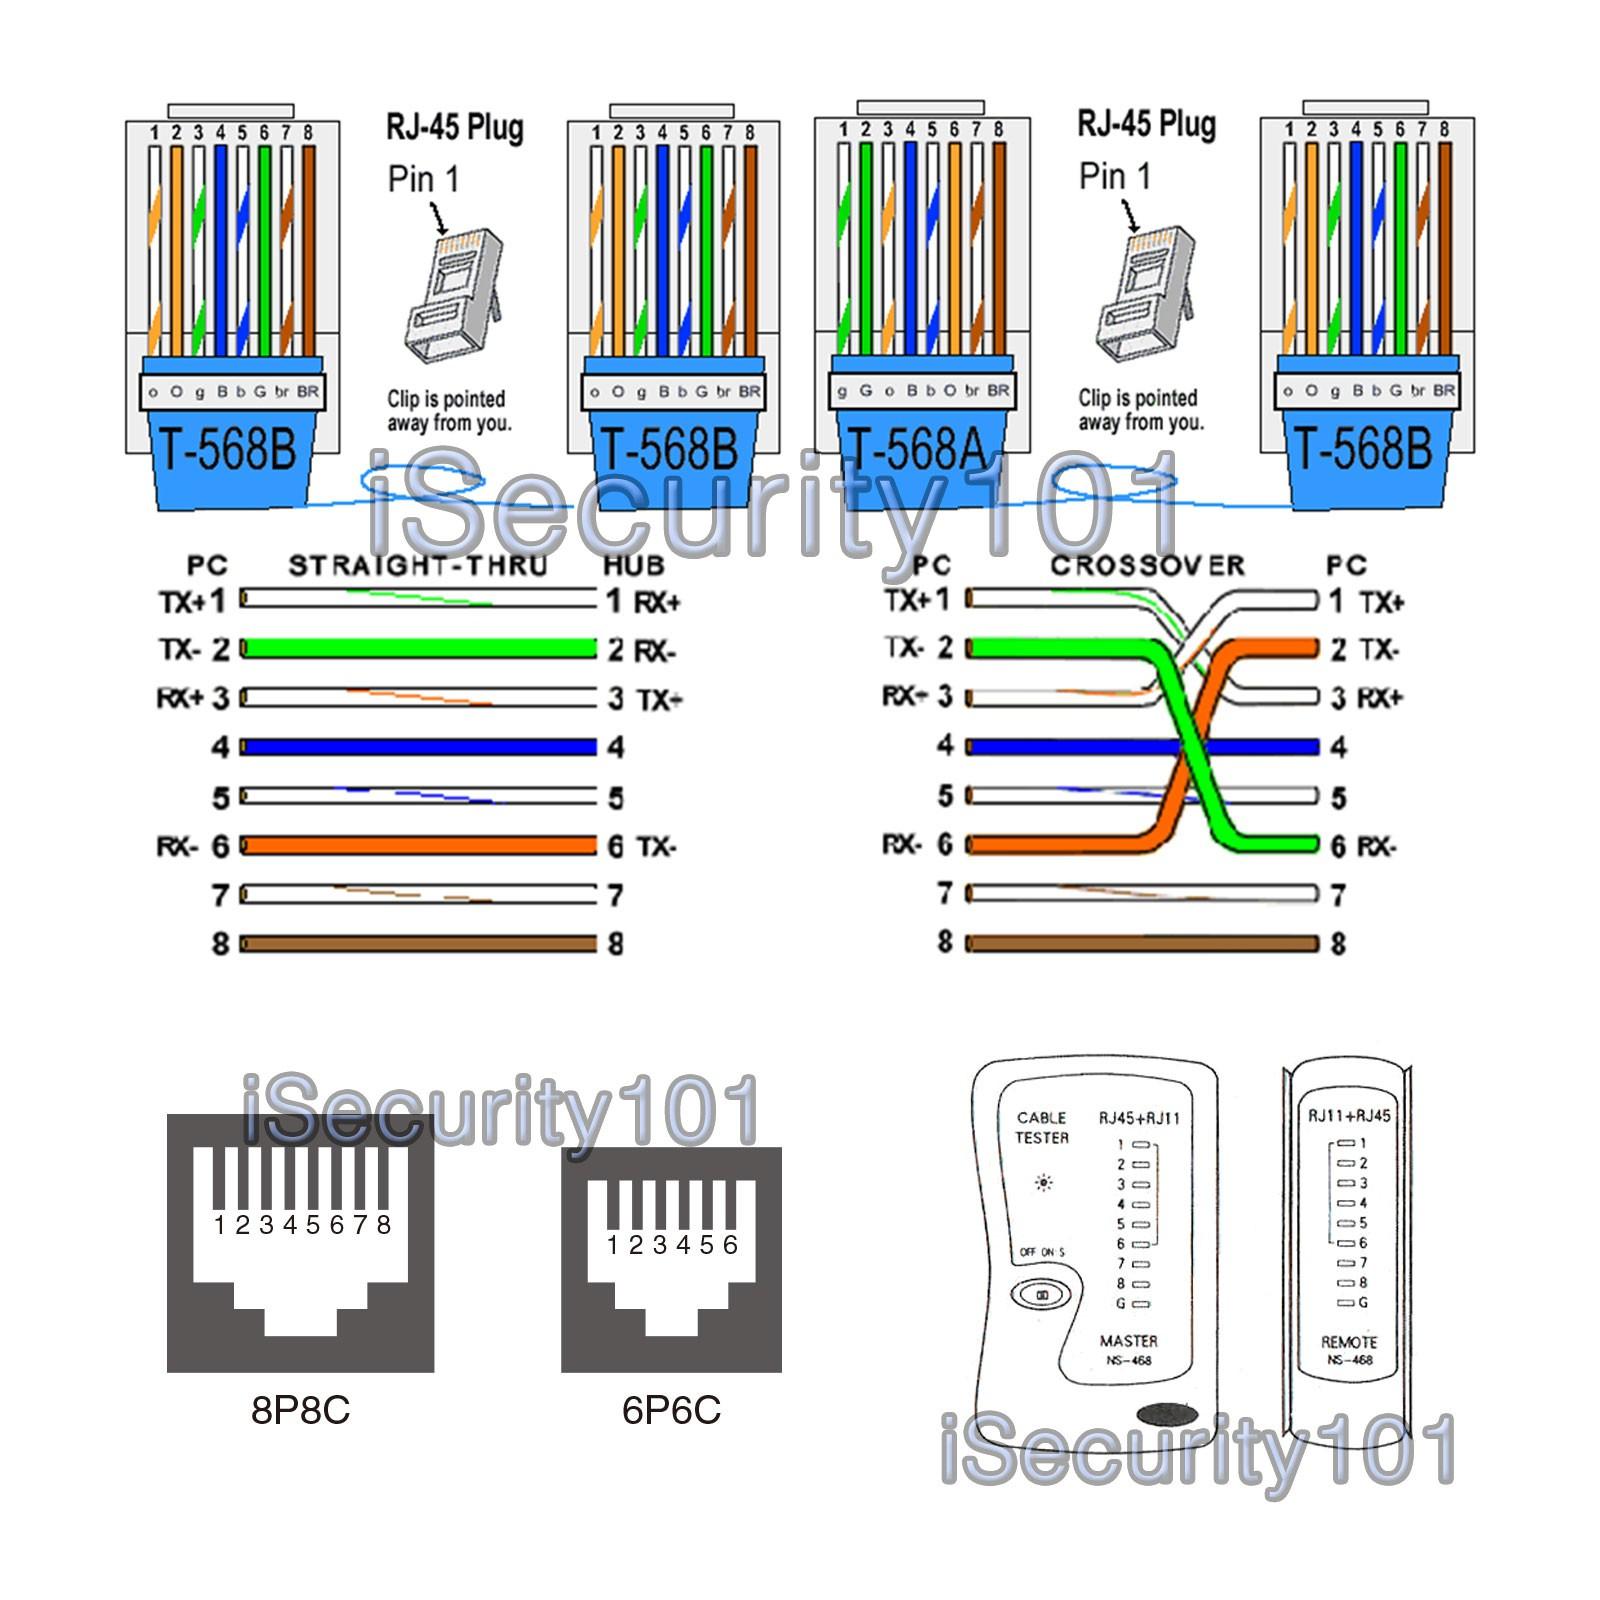 Female Rj45 Cat 5E Wiring Diagram | Wiring Diagram - Cat 5 568B - 568 B Wiring Diagram